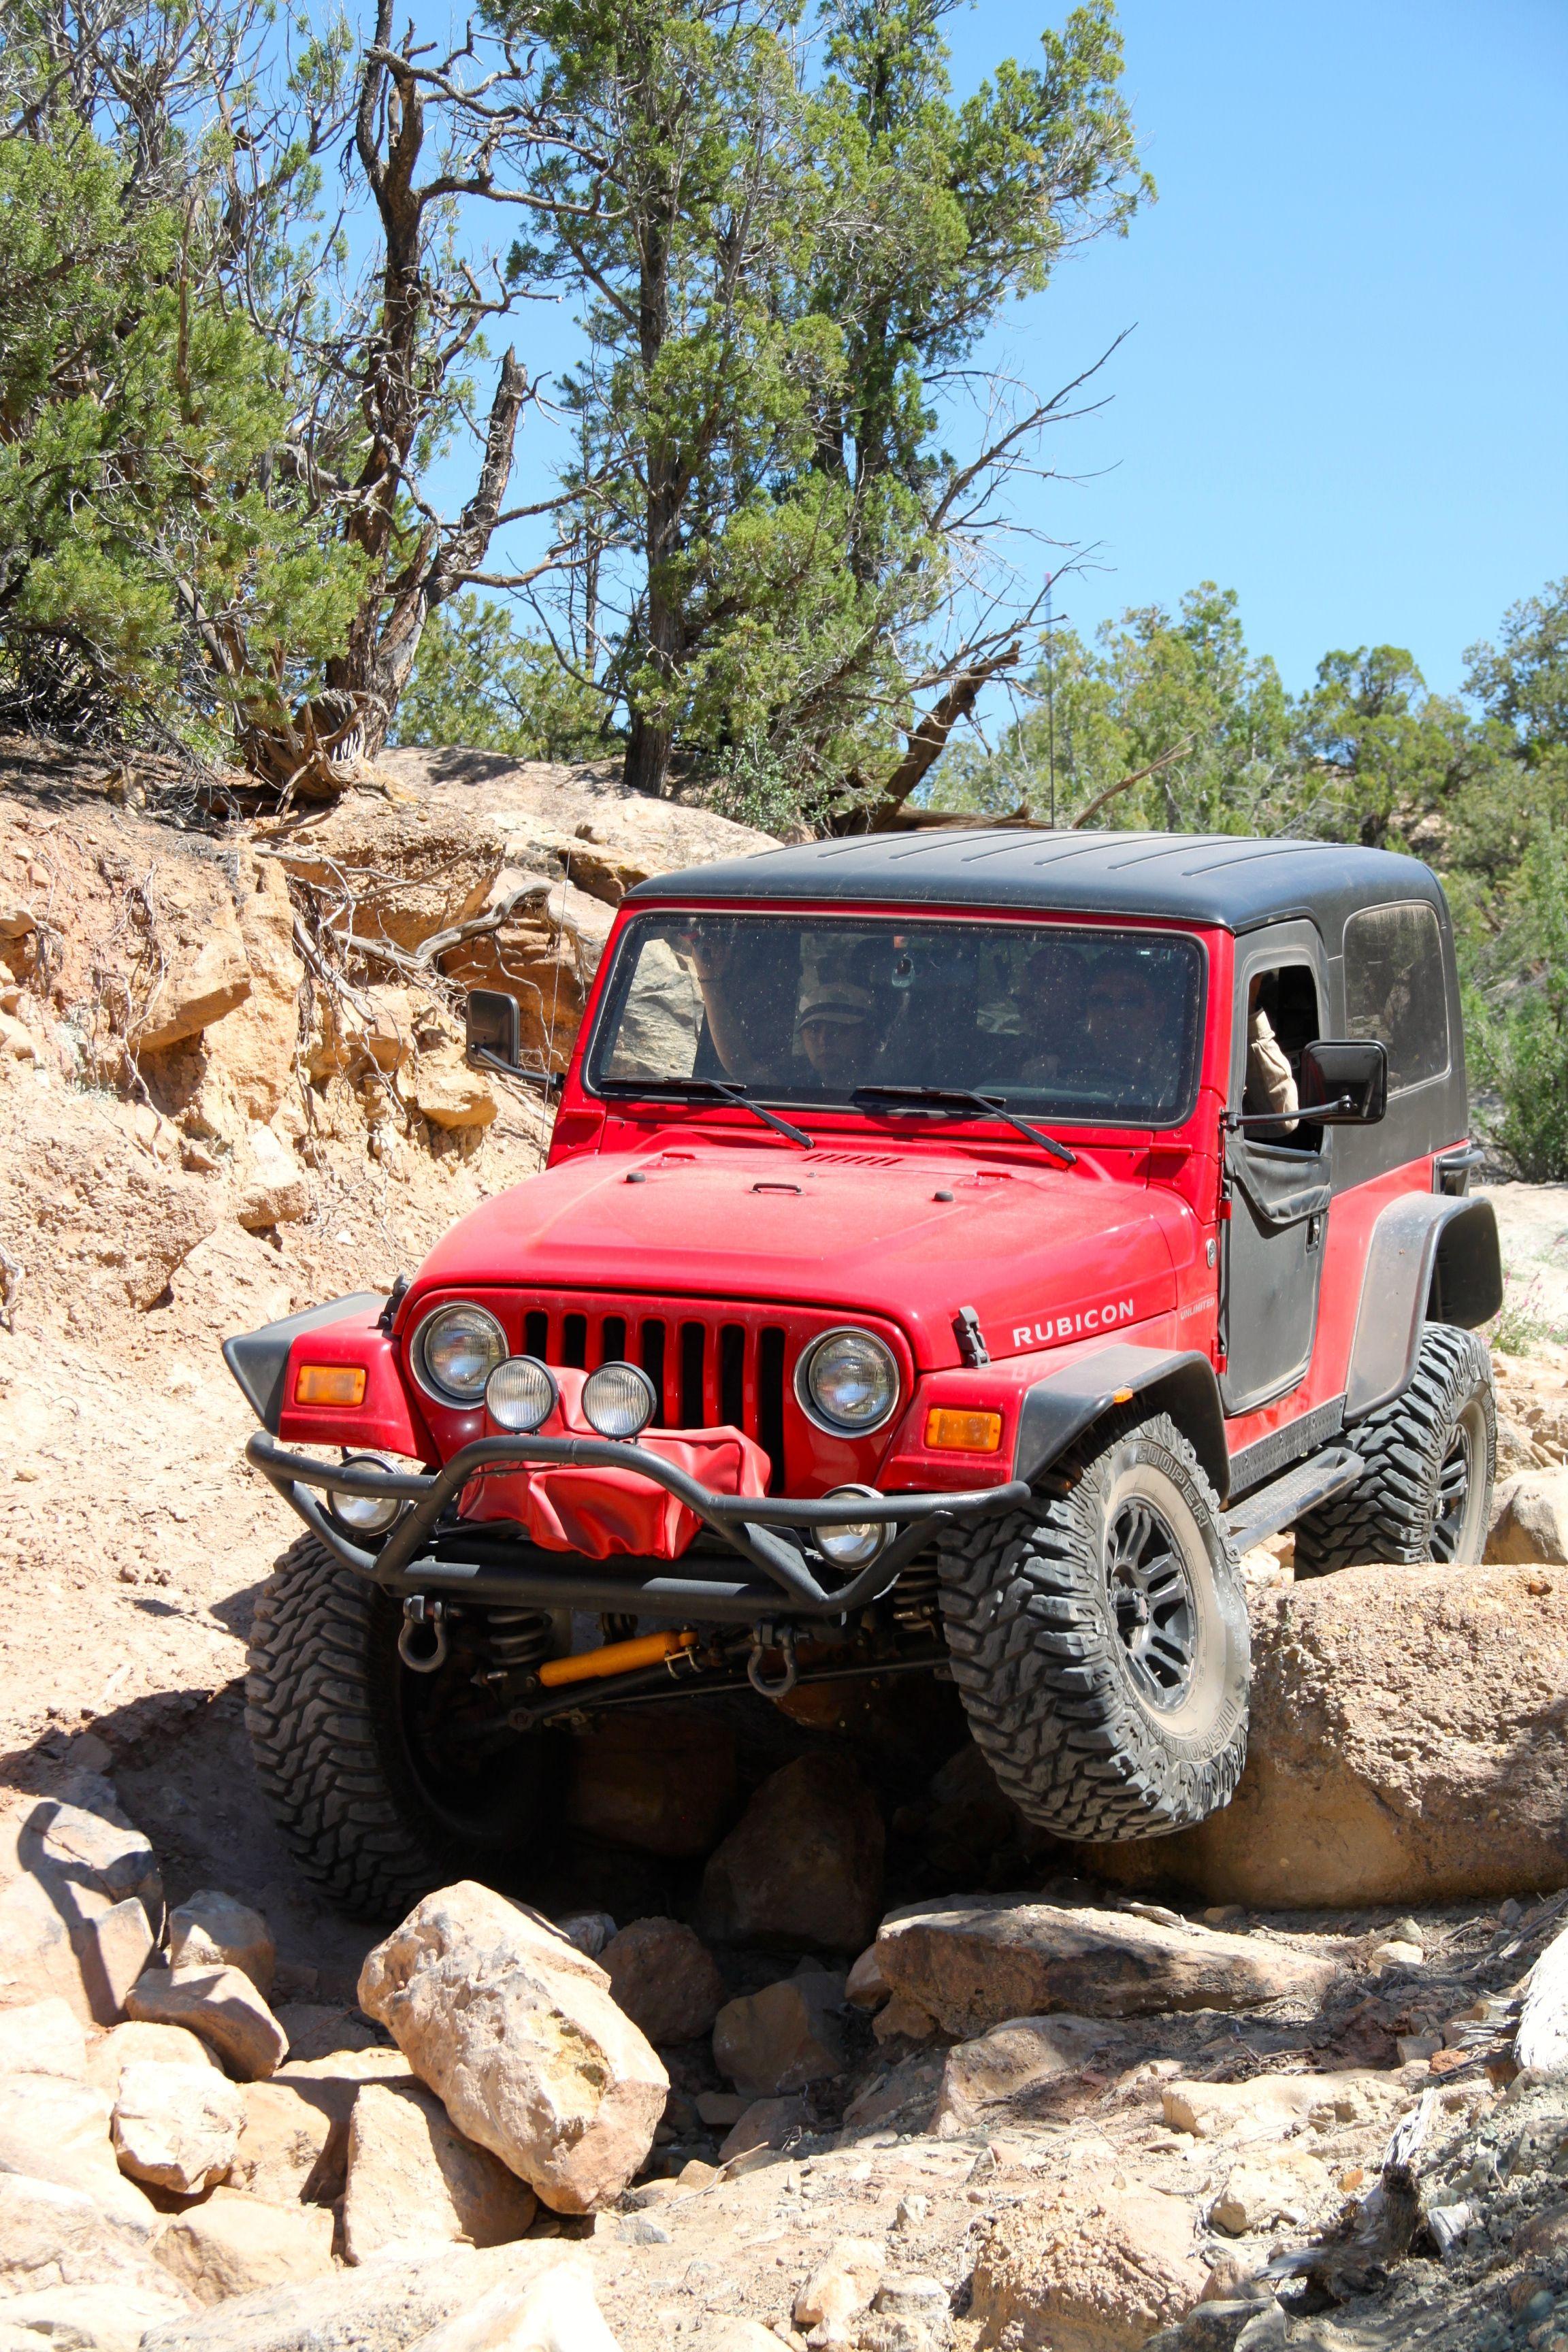 Roger On Gyration Wash Jeep Trails Jeep Wrangler Tj Off Road